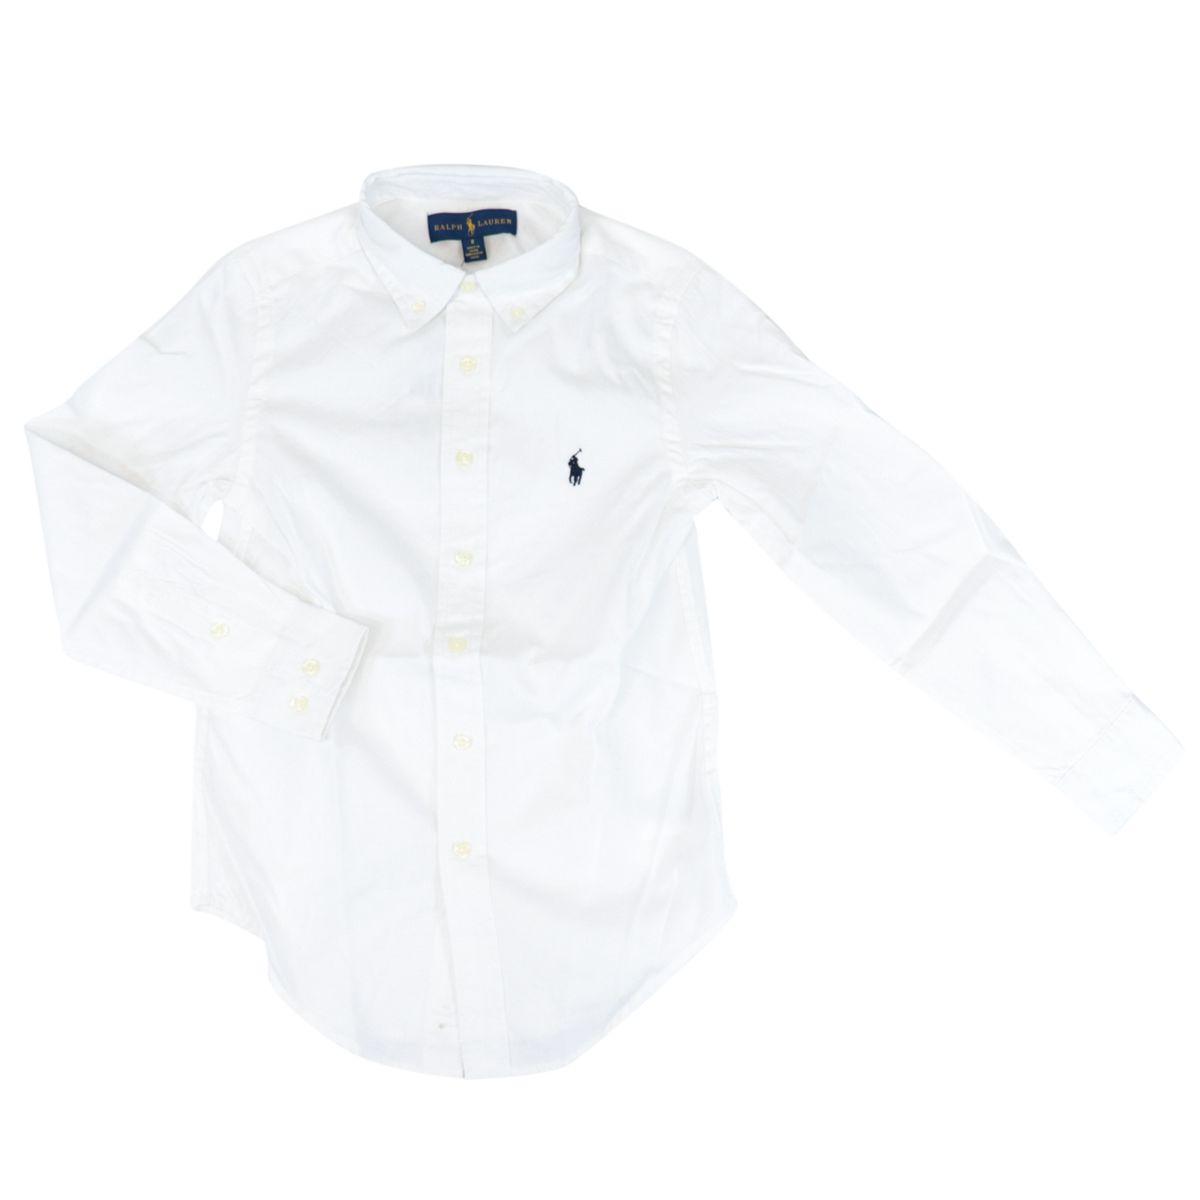 Cotton shirt with botton down collar White Polo Ralph Lauren